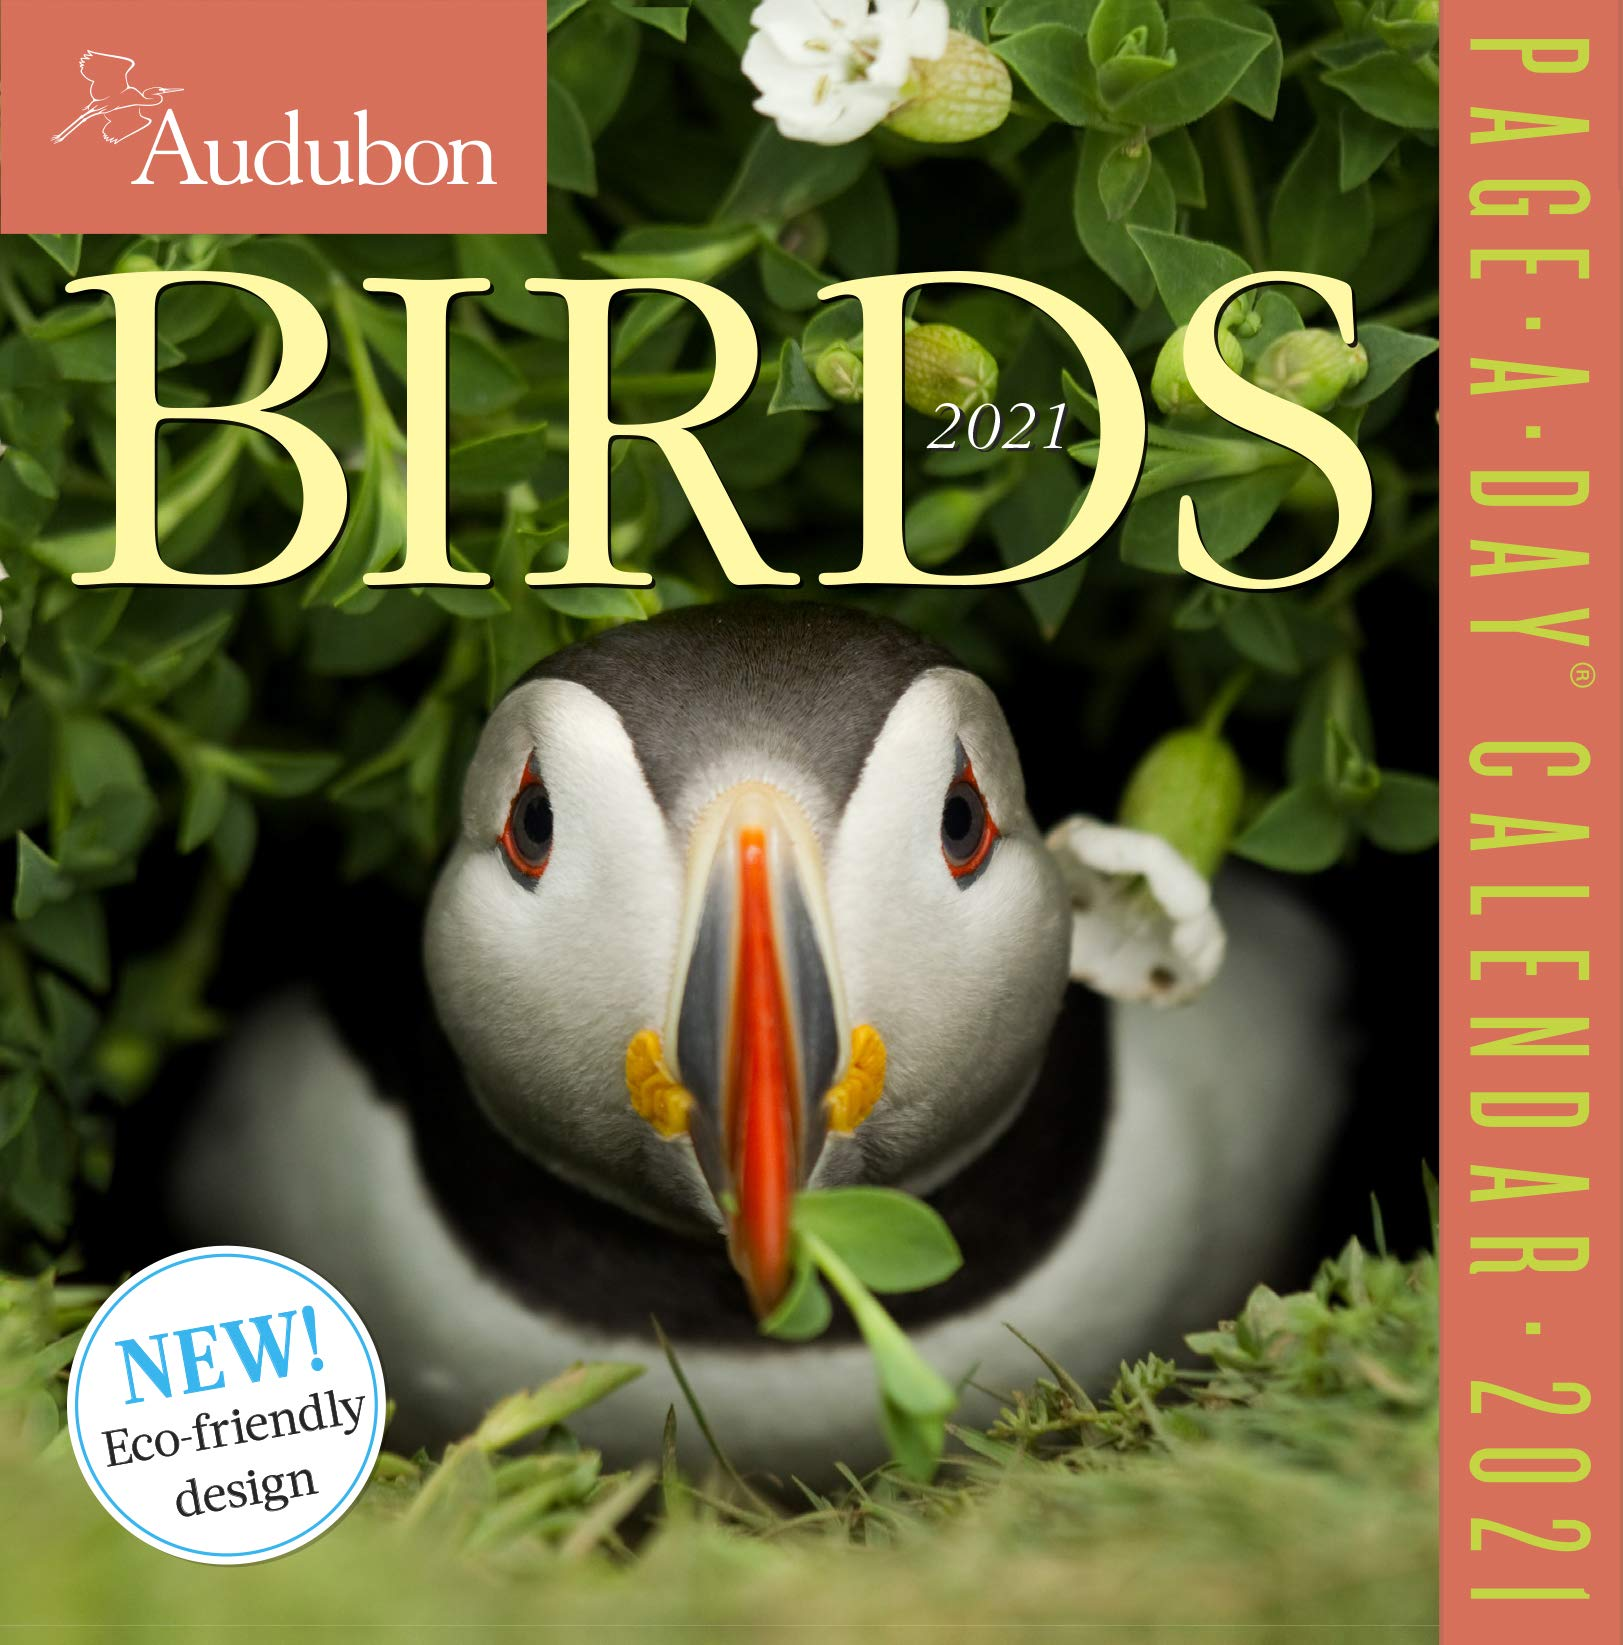 Audubon Bird Calendar 2021 Amazon.com: Audubon Birds Page A Day Calendar 2021 (9781523508990